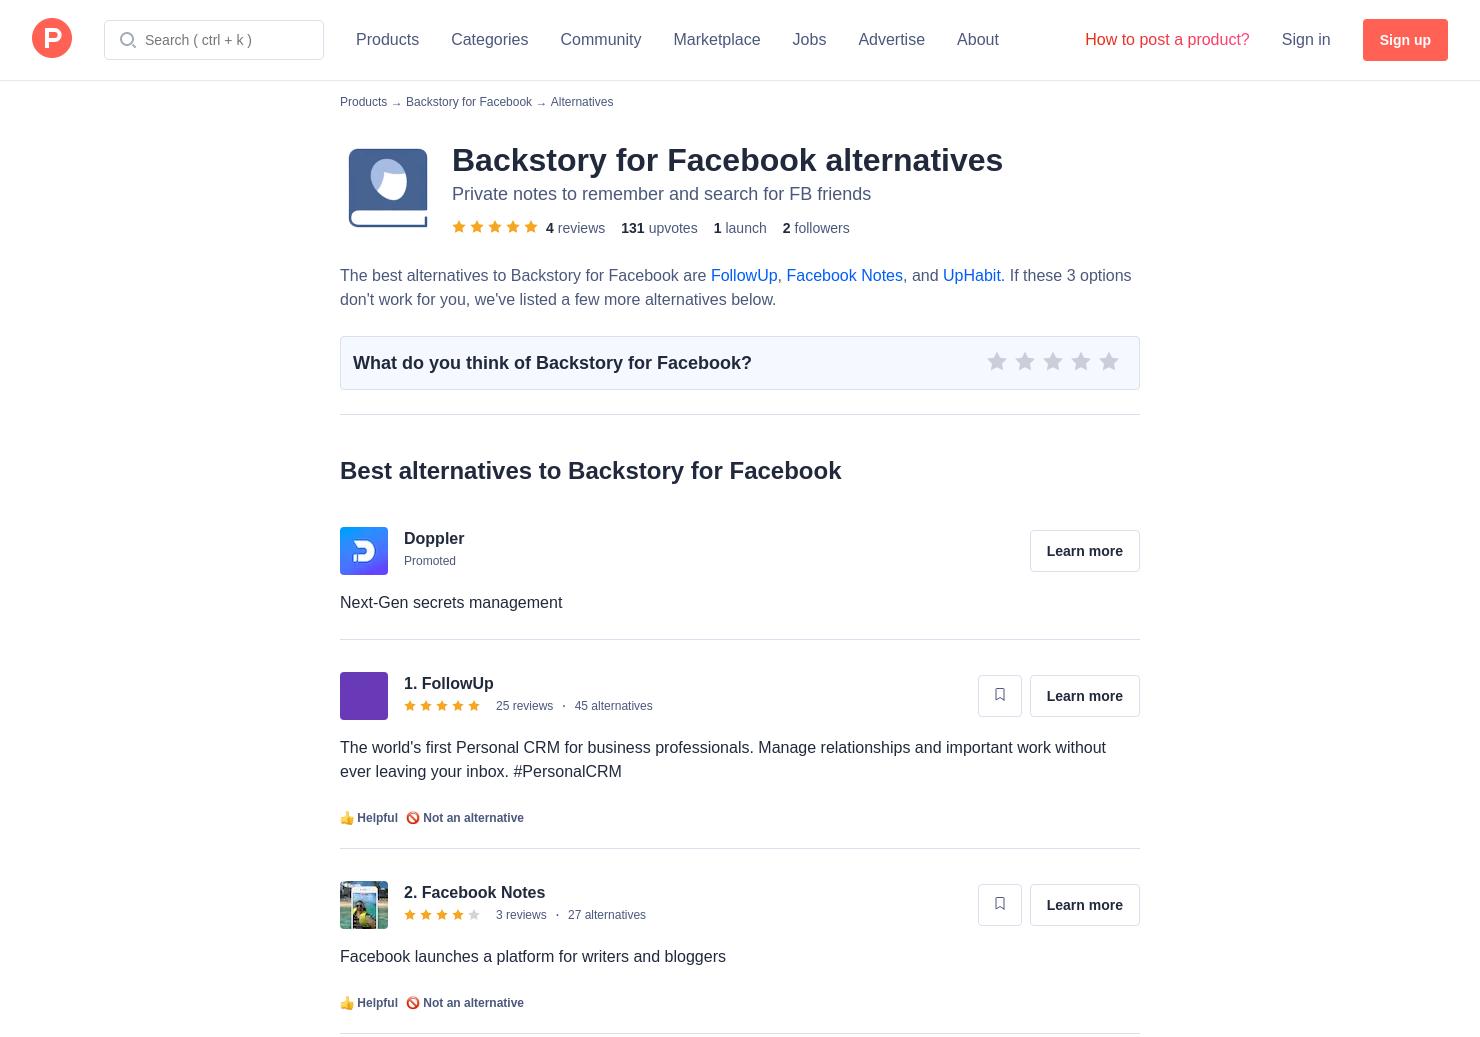 7 Alternatives to Backstory for Facebook for Chrome